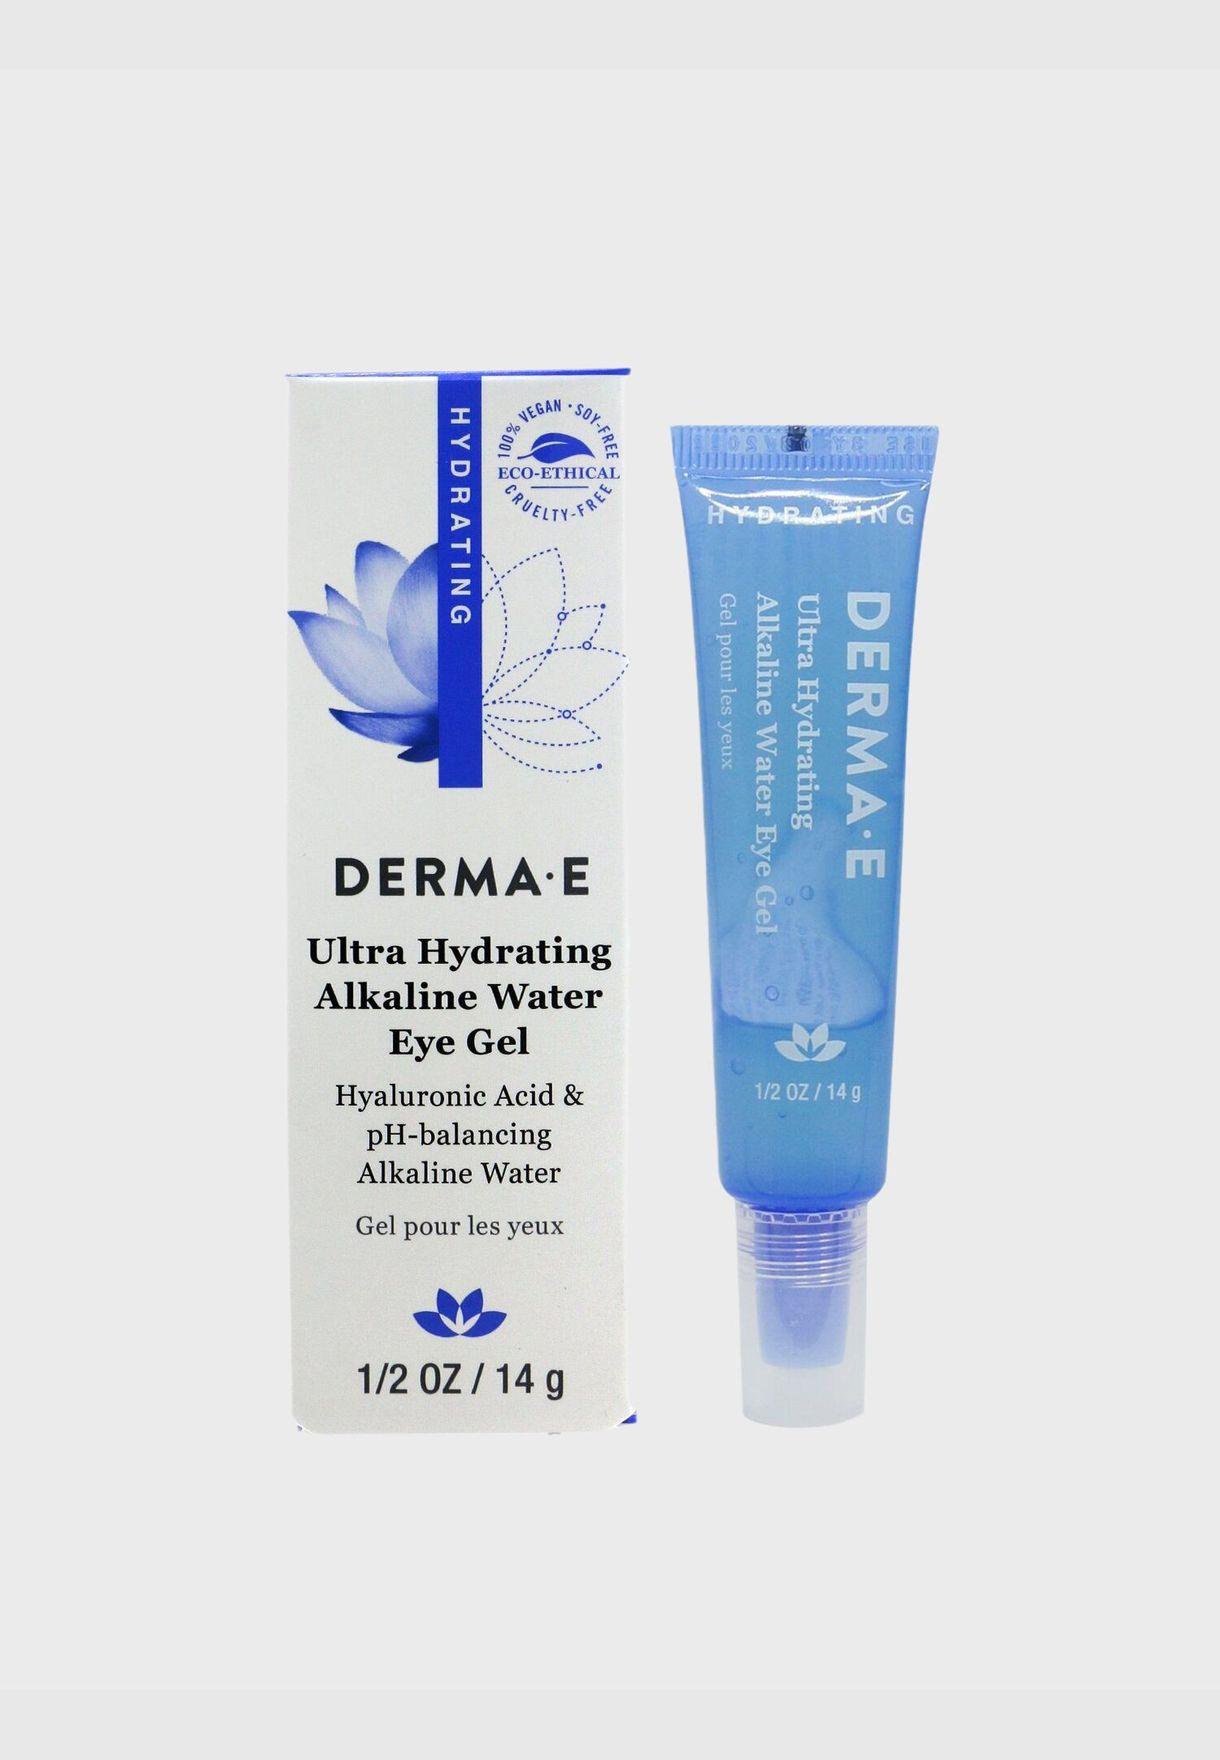 Hydrating Ultra Hydrating Alkaline Water Eye Gel